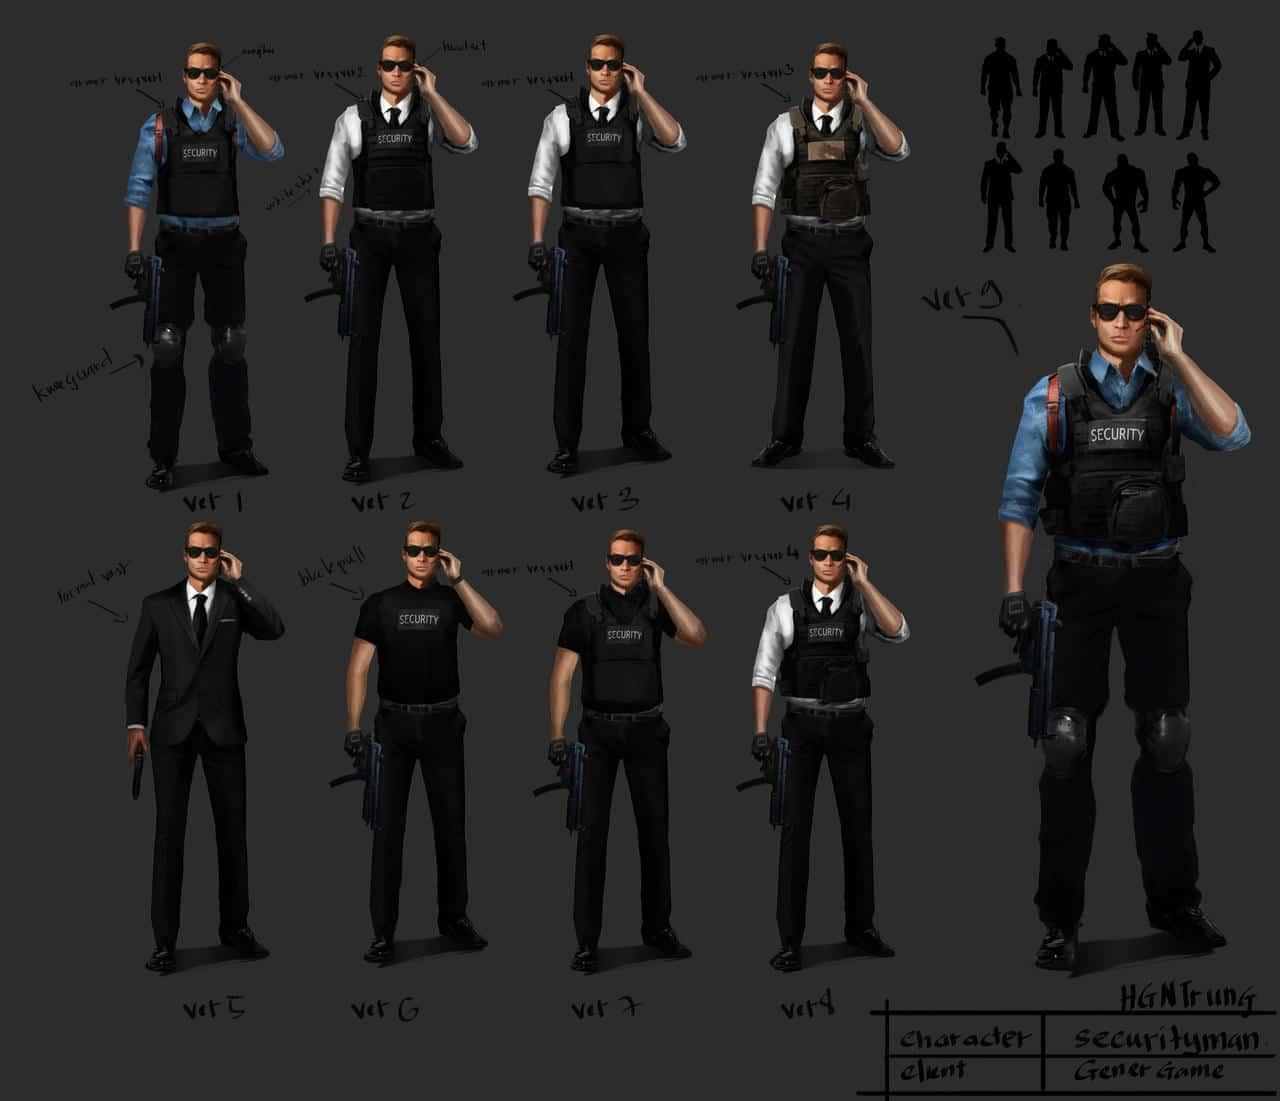 Character Design- Security Man by hgntrung on DeviantArt